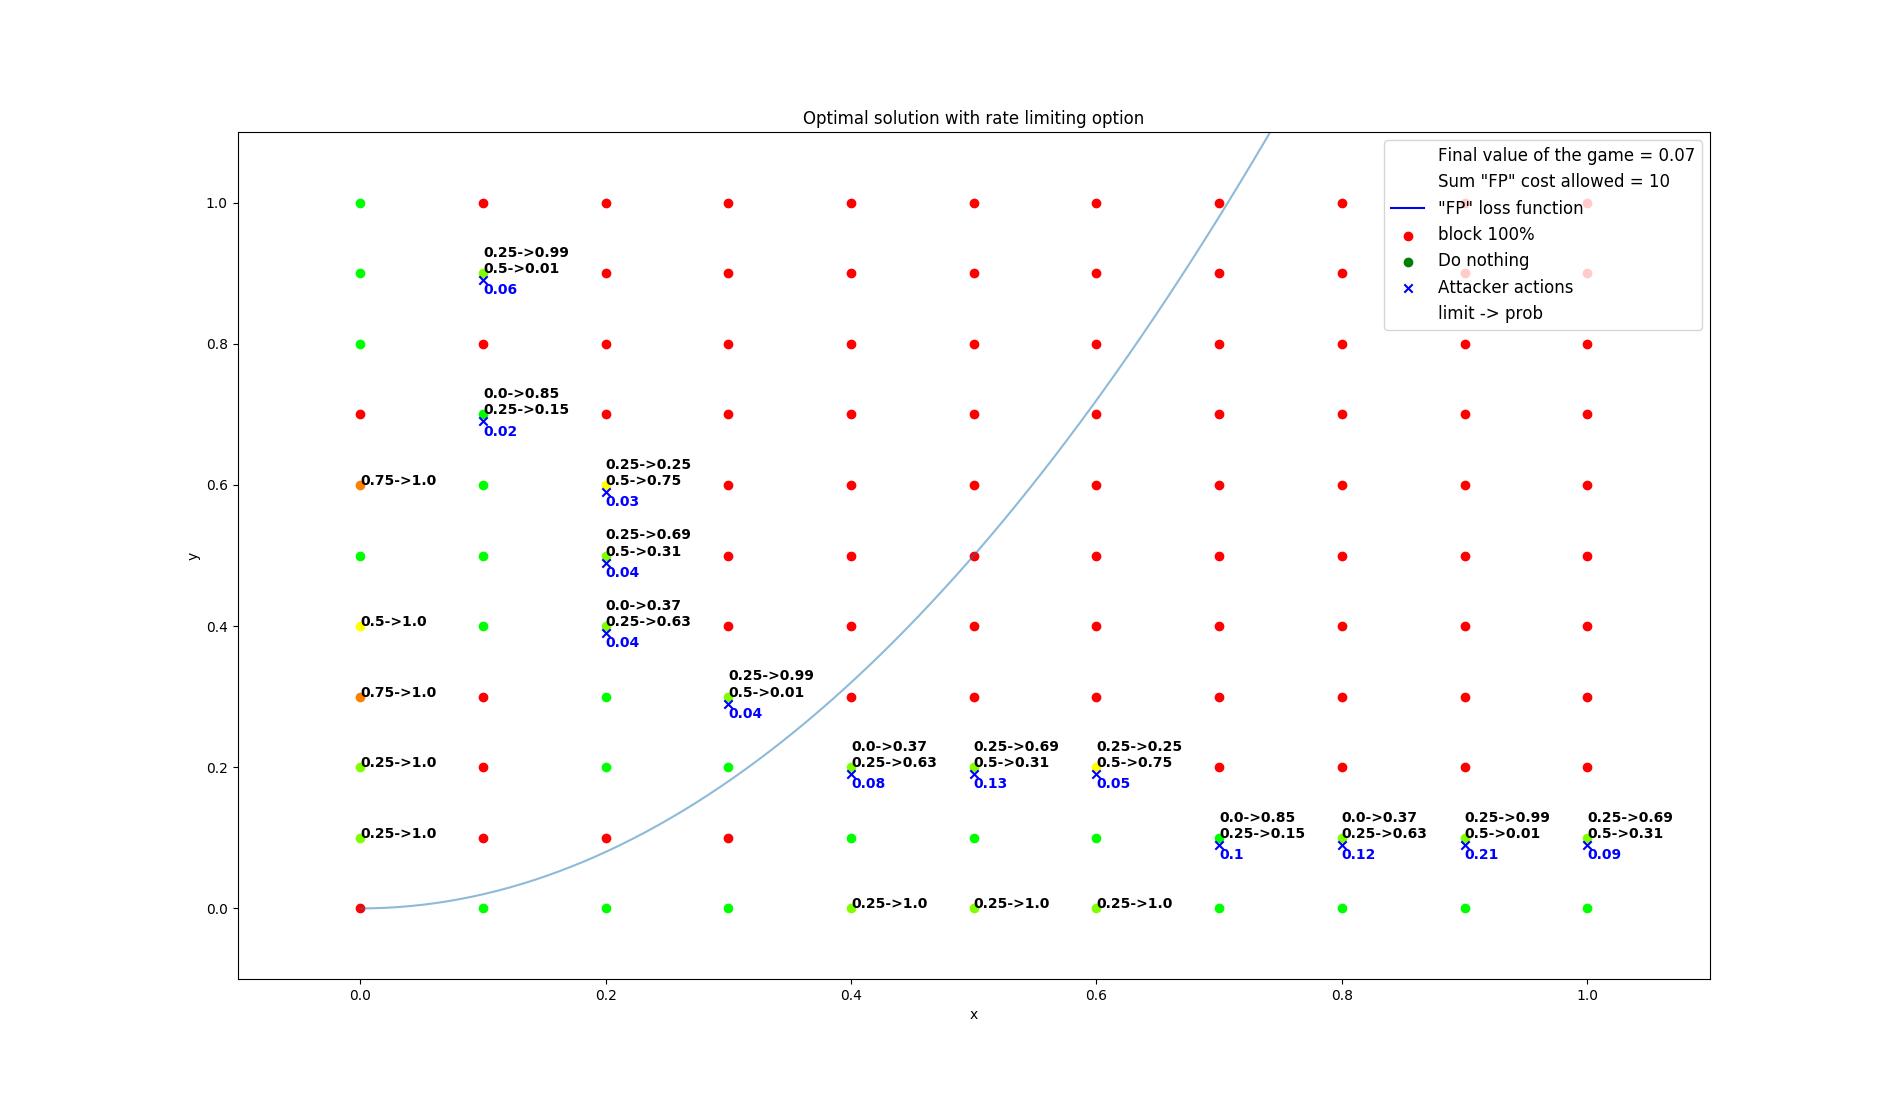 results/optimal/false_positive_constraint/23-summarization.png